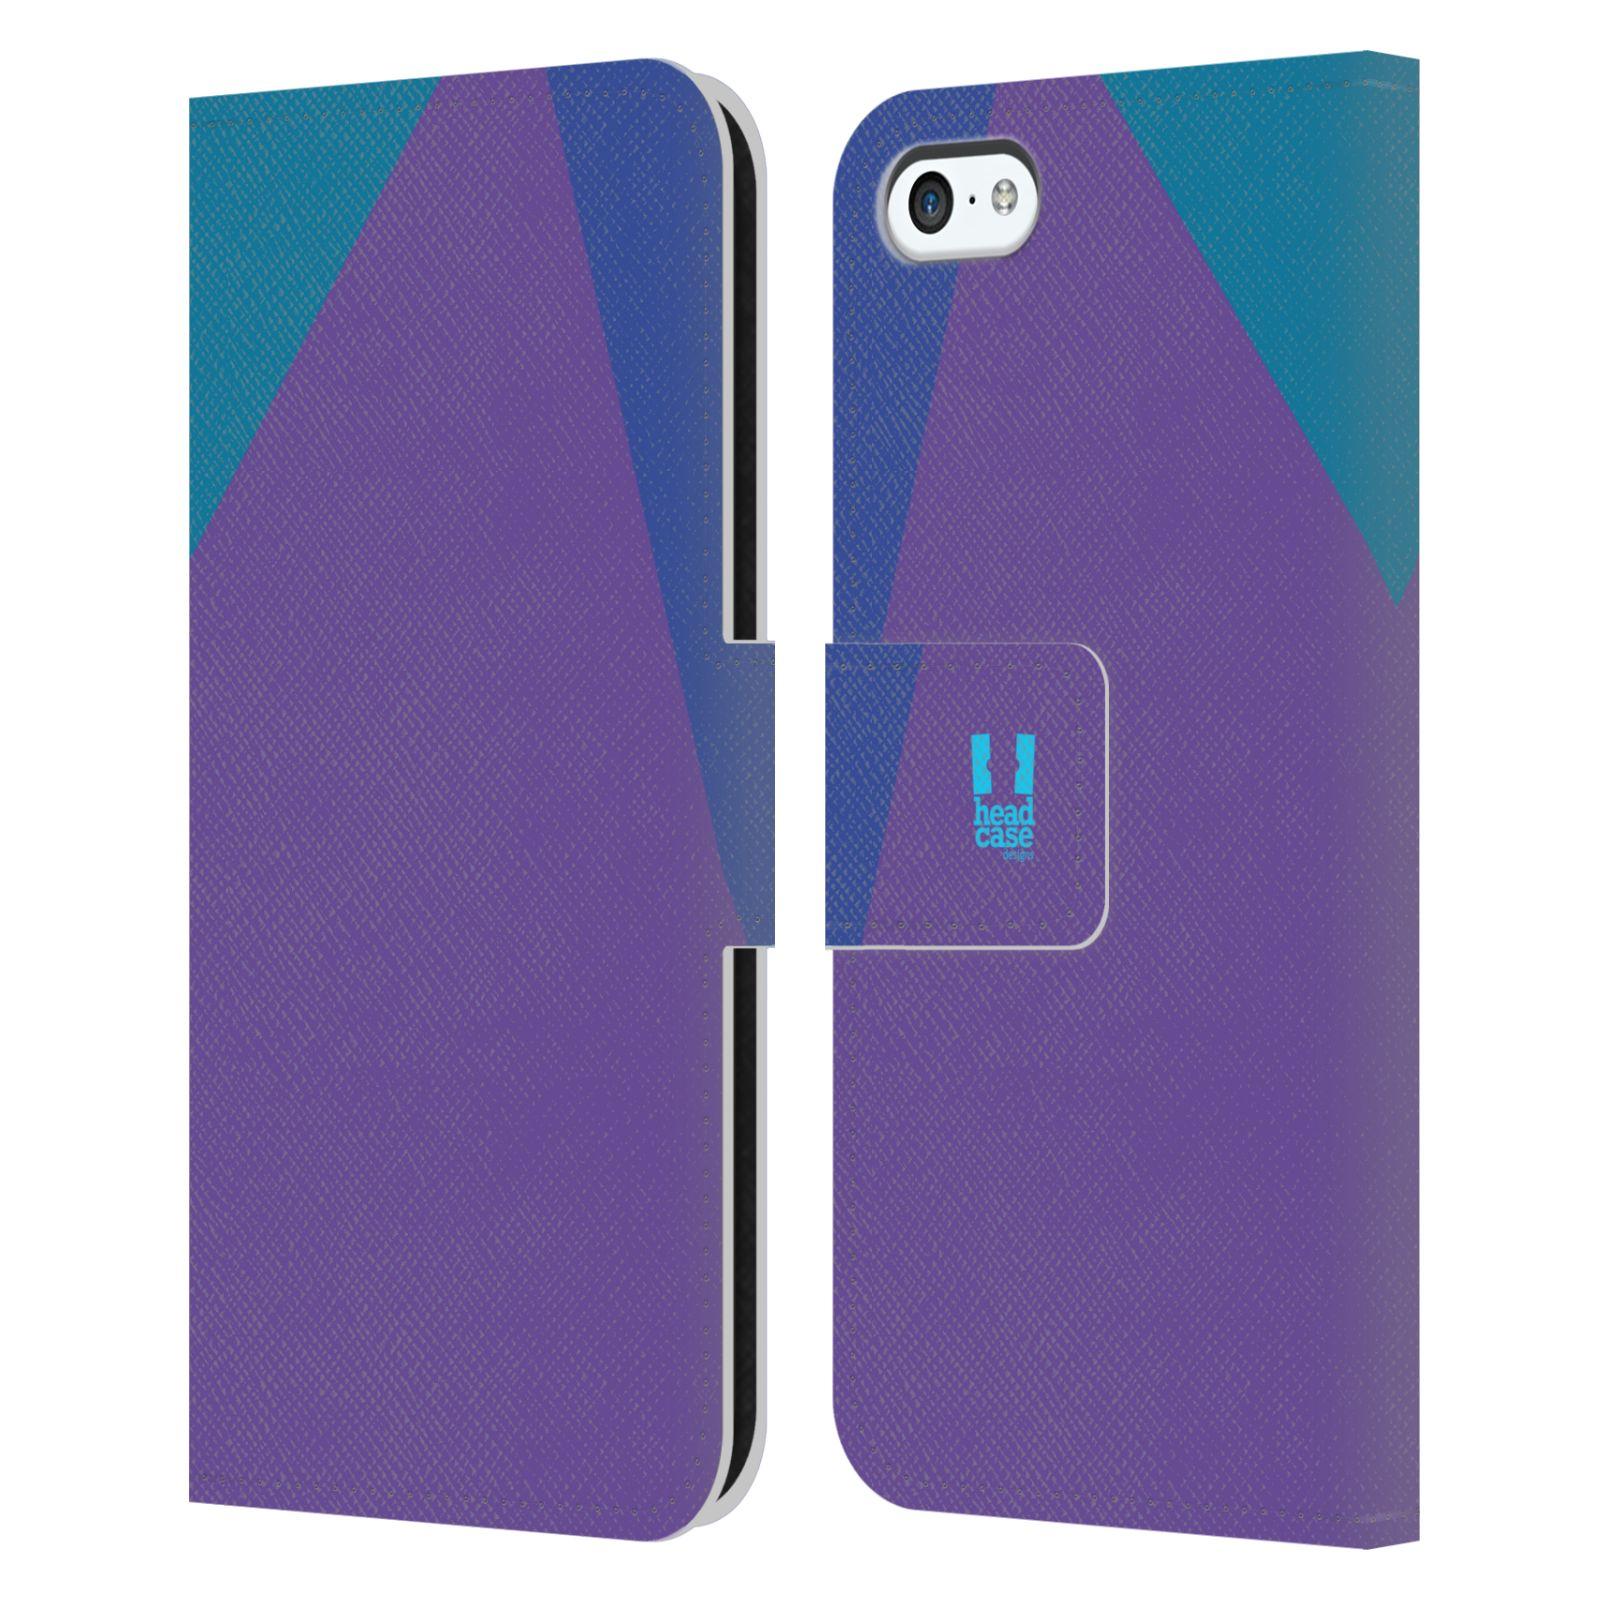 HEAD CASE Flipové pouzdro pro mobil Apple Iphone 5C barevné tvary fialová feminine